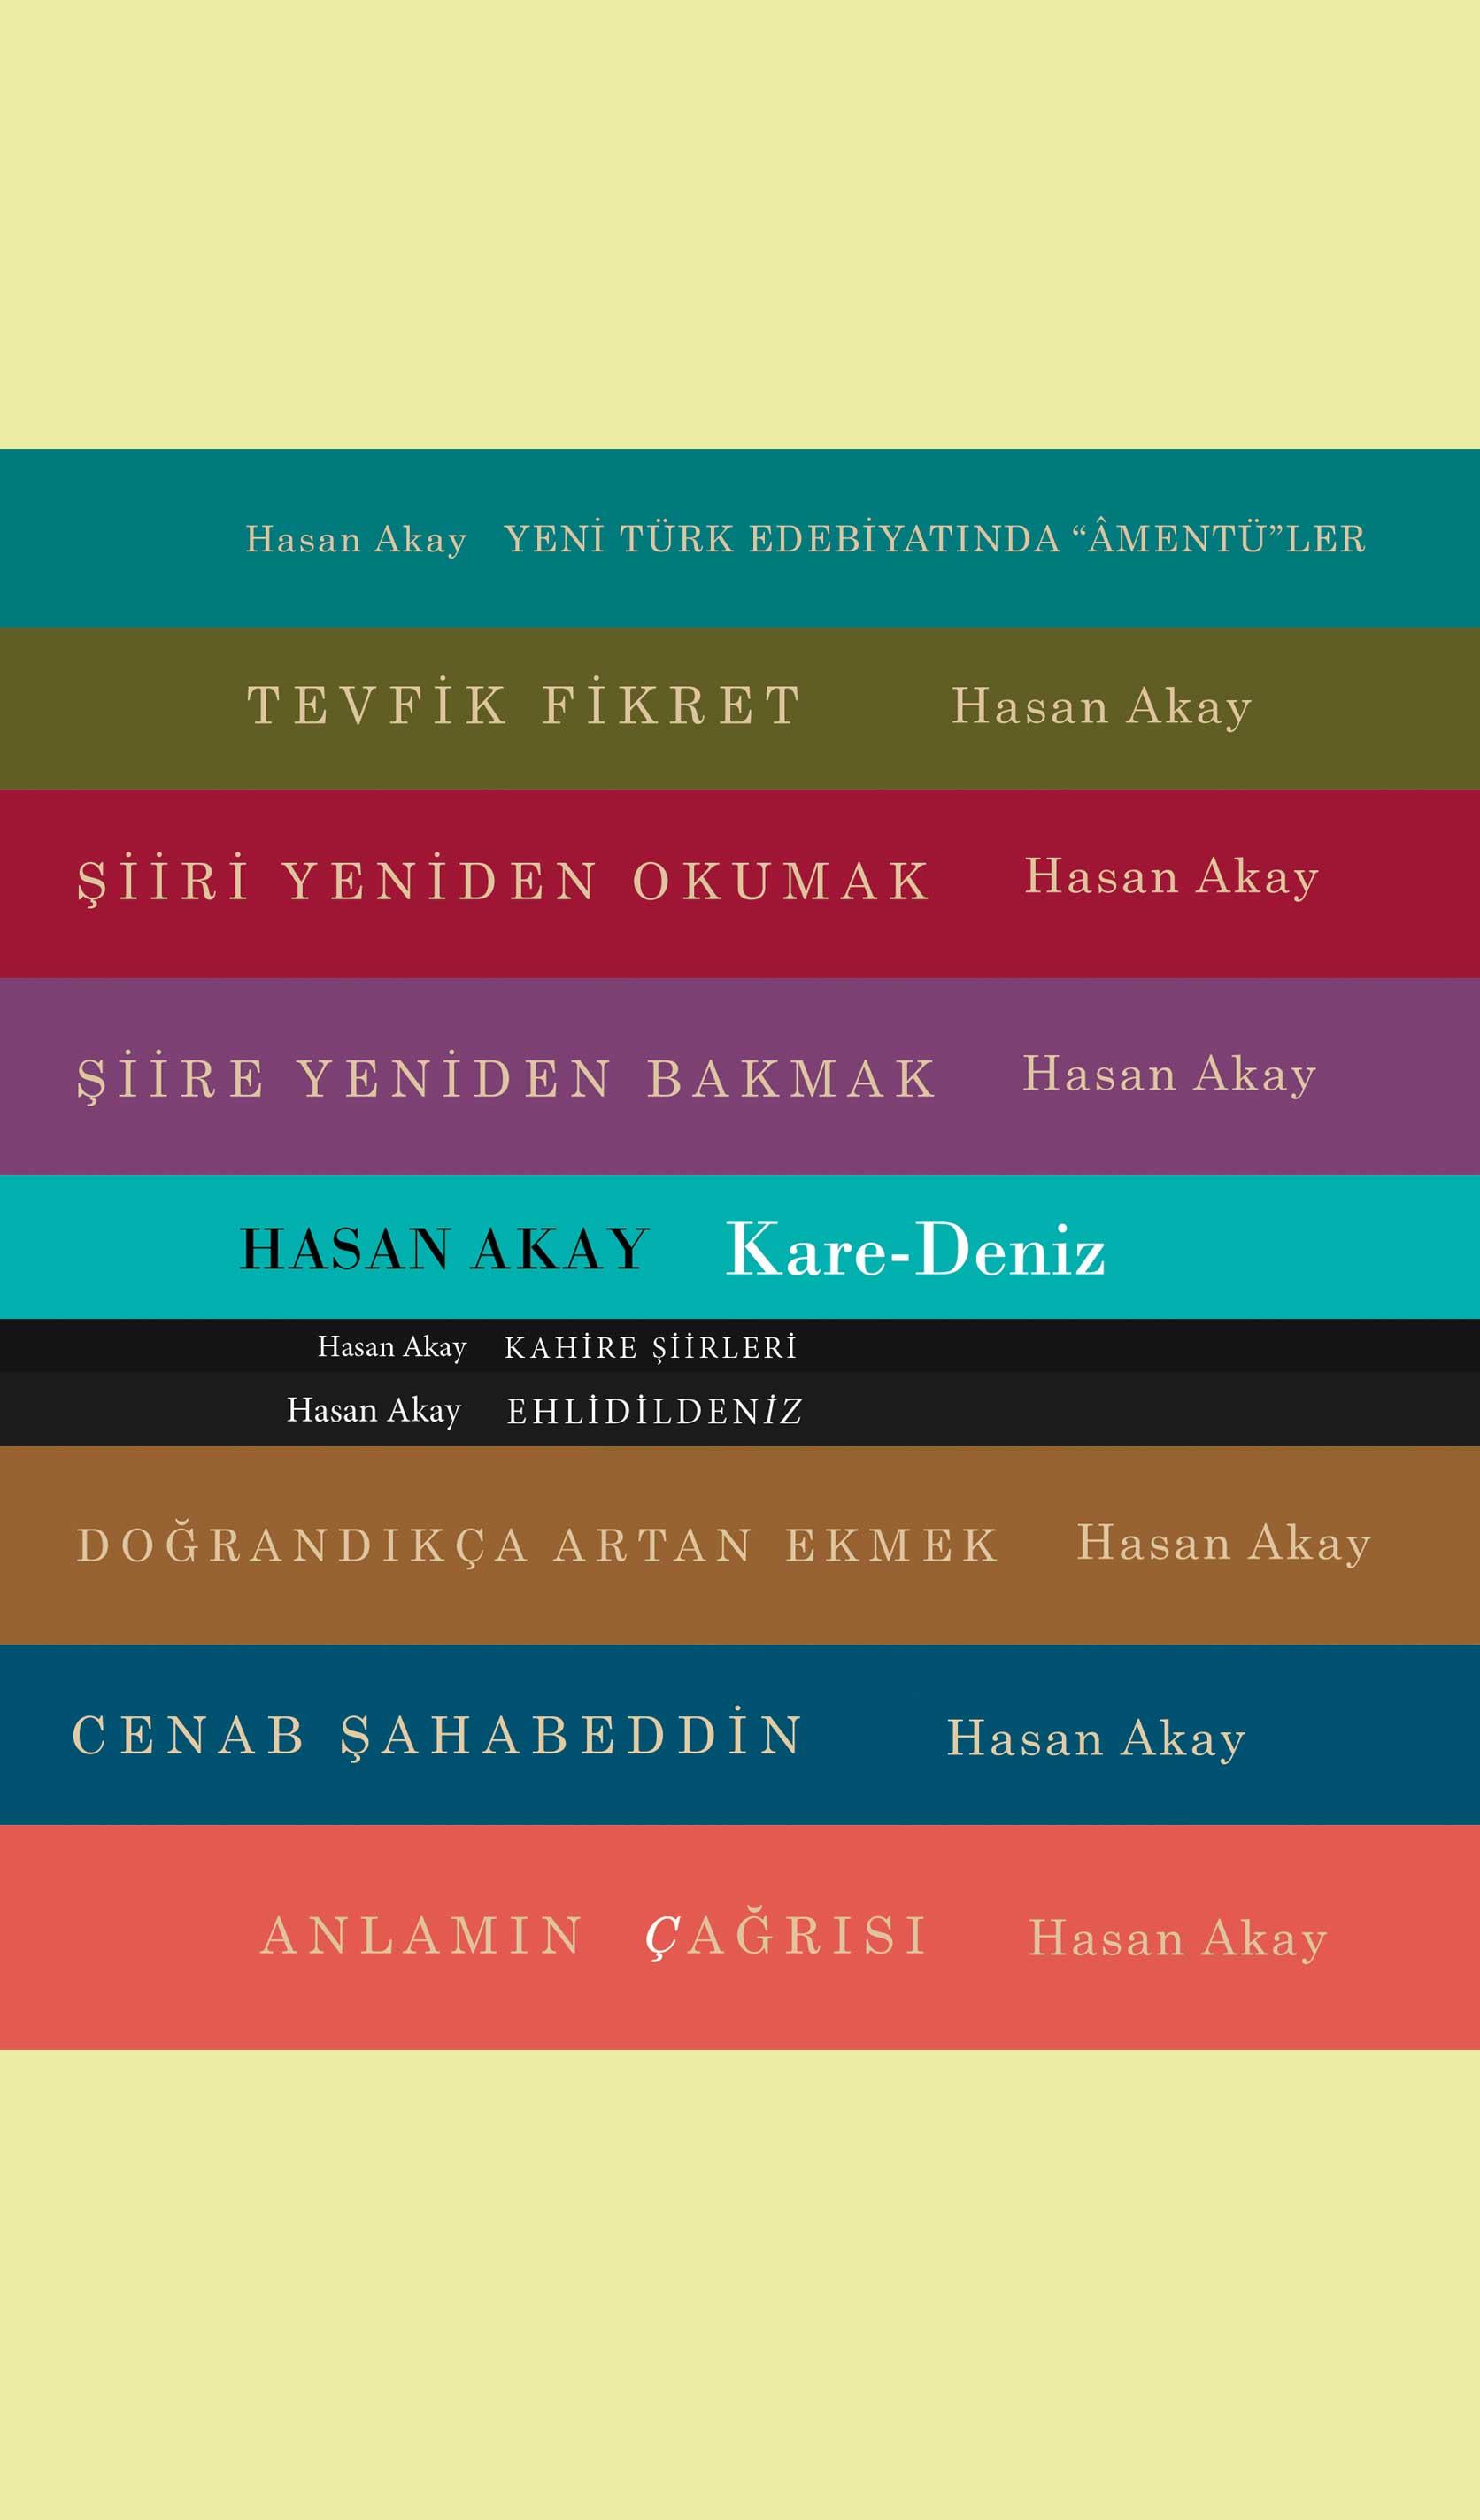 Hasan Akay Kitapları